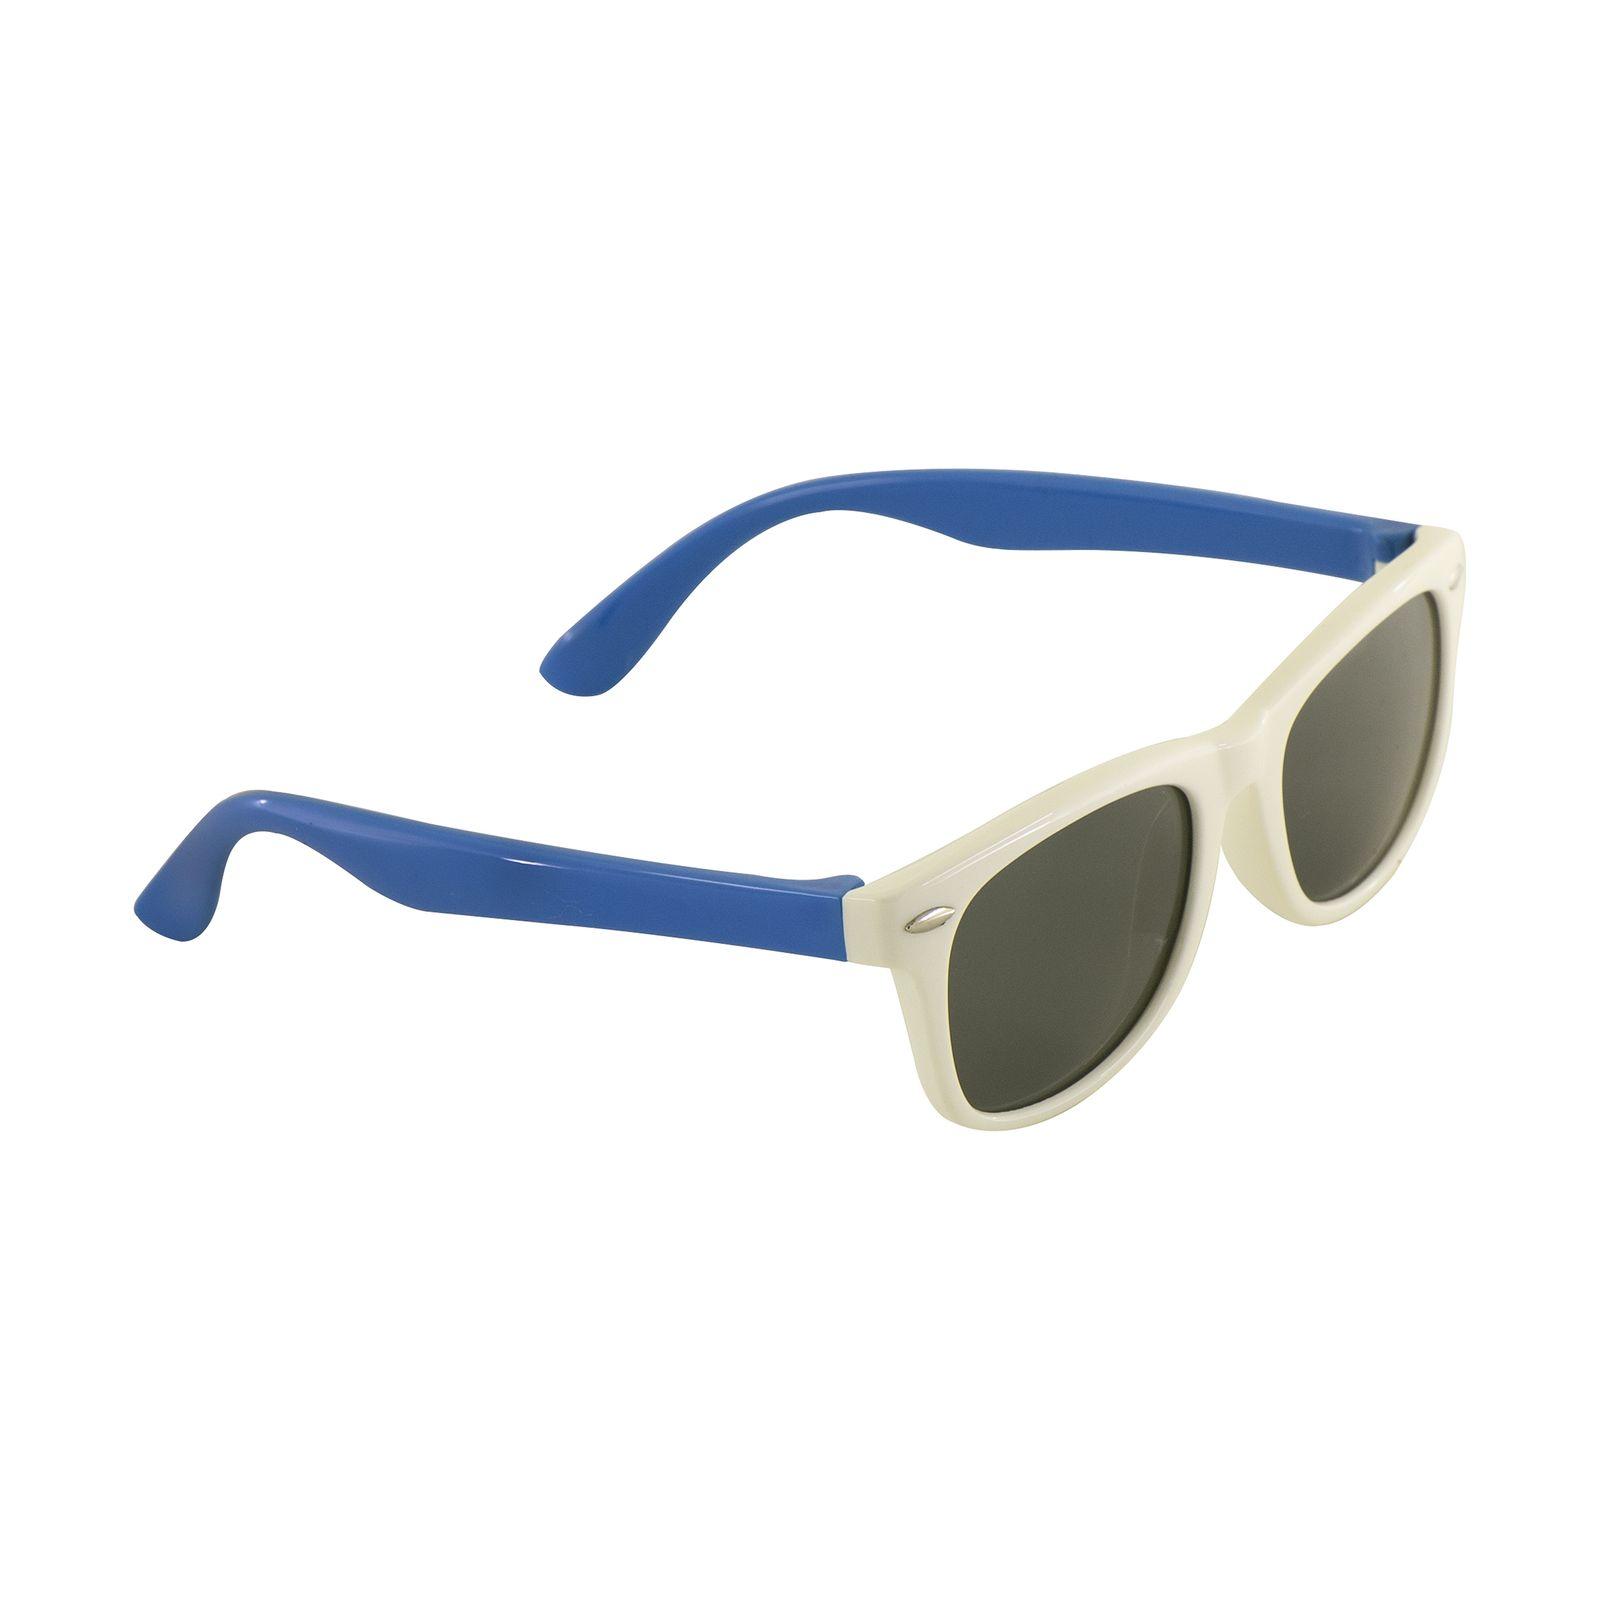 عینک آفتابی پسرانه کد S802 -  - 3